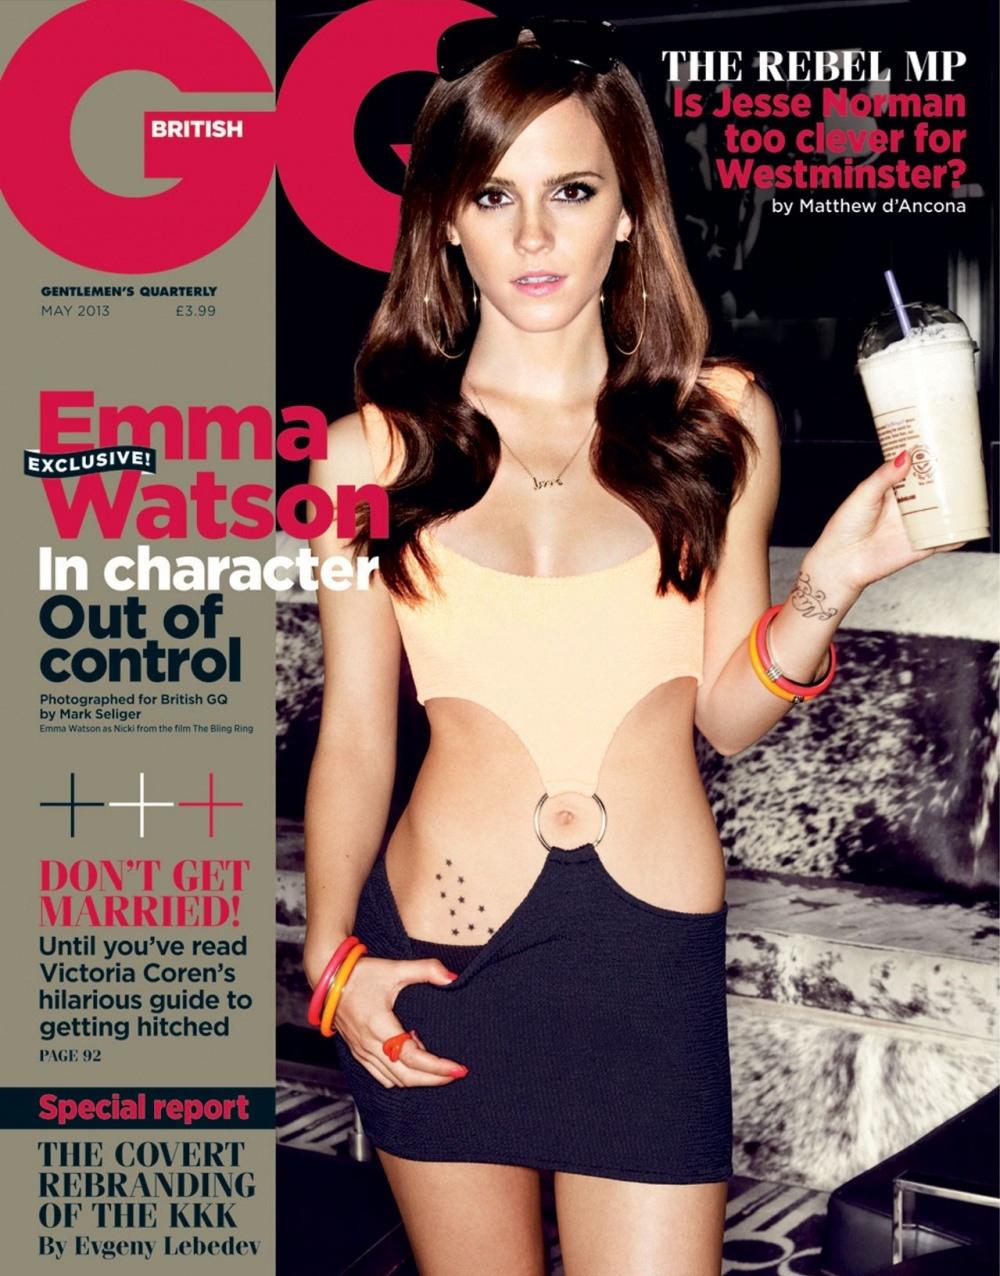 gq-magazine-photoshoot-photo-retouching-sample